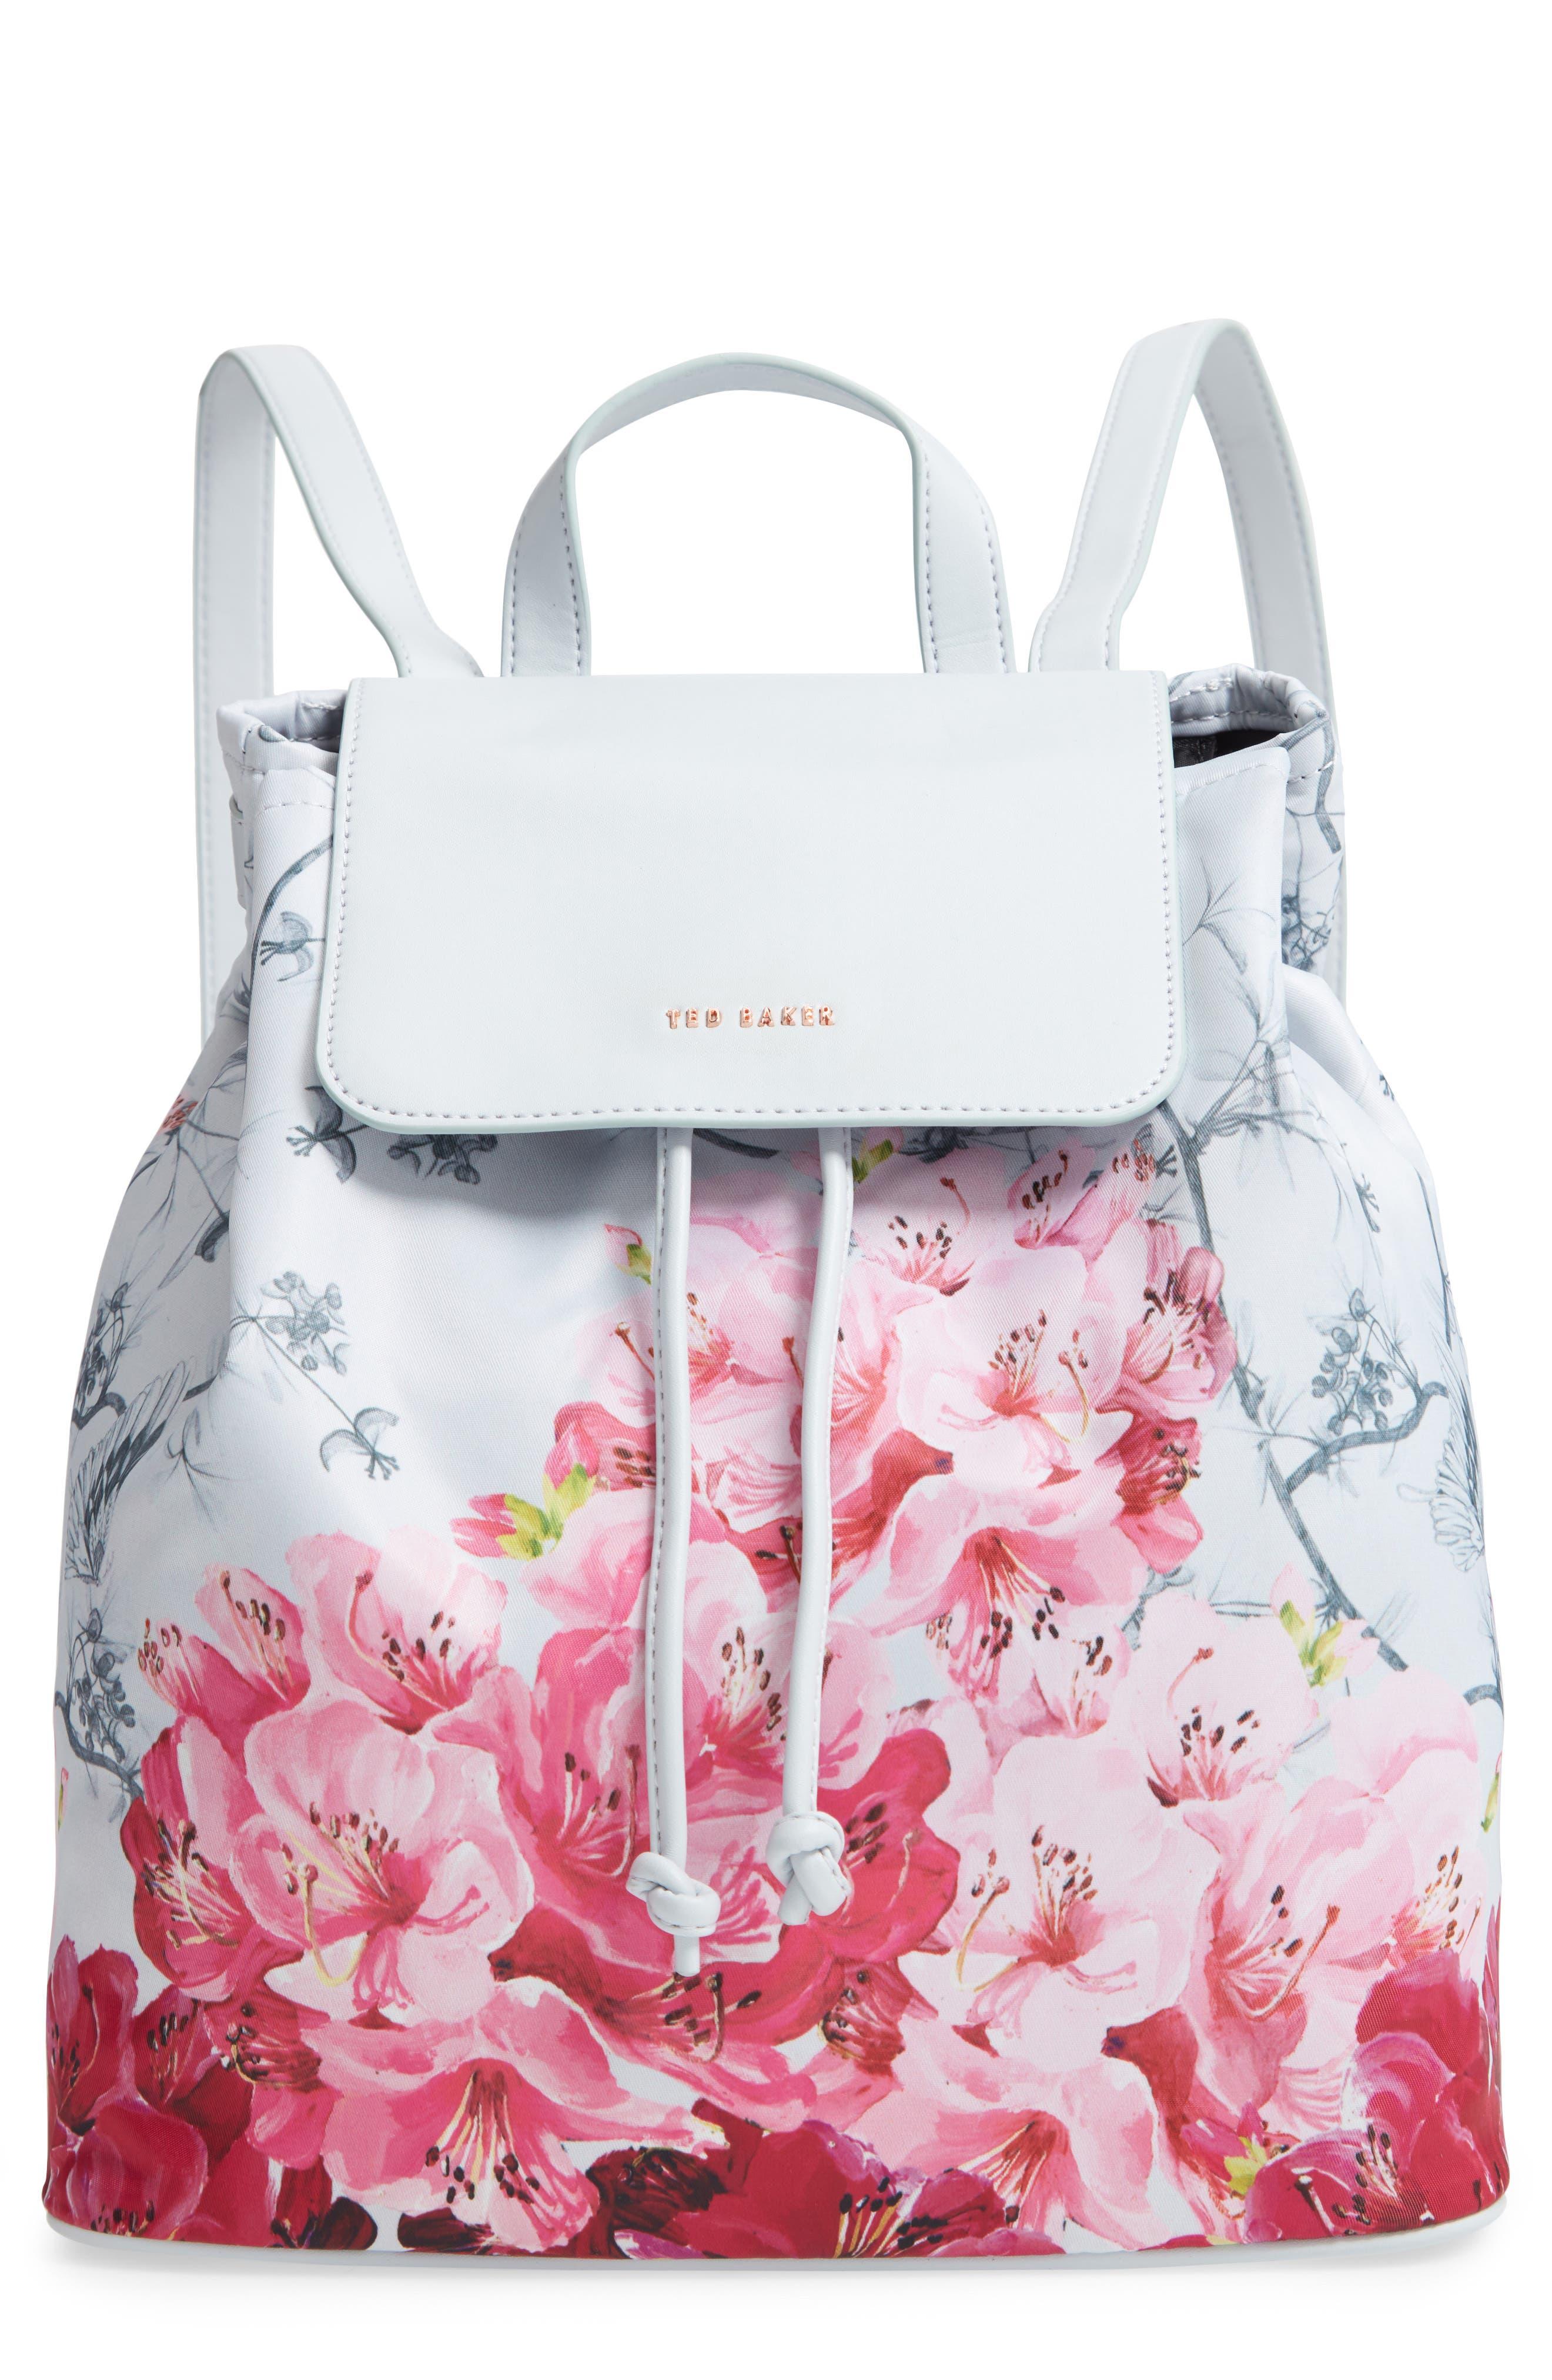 Belisaa Babylon Print Nylon Backpack,                         Main,                         color, GREY